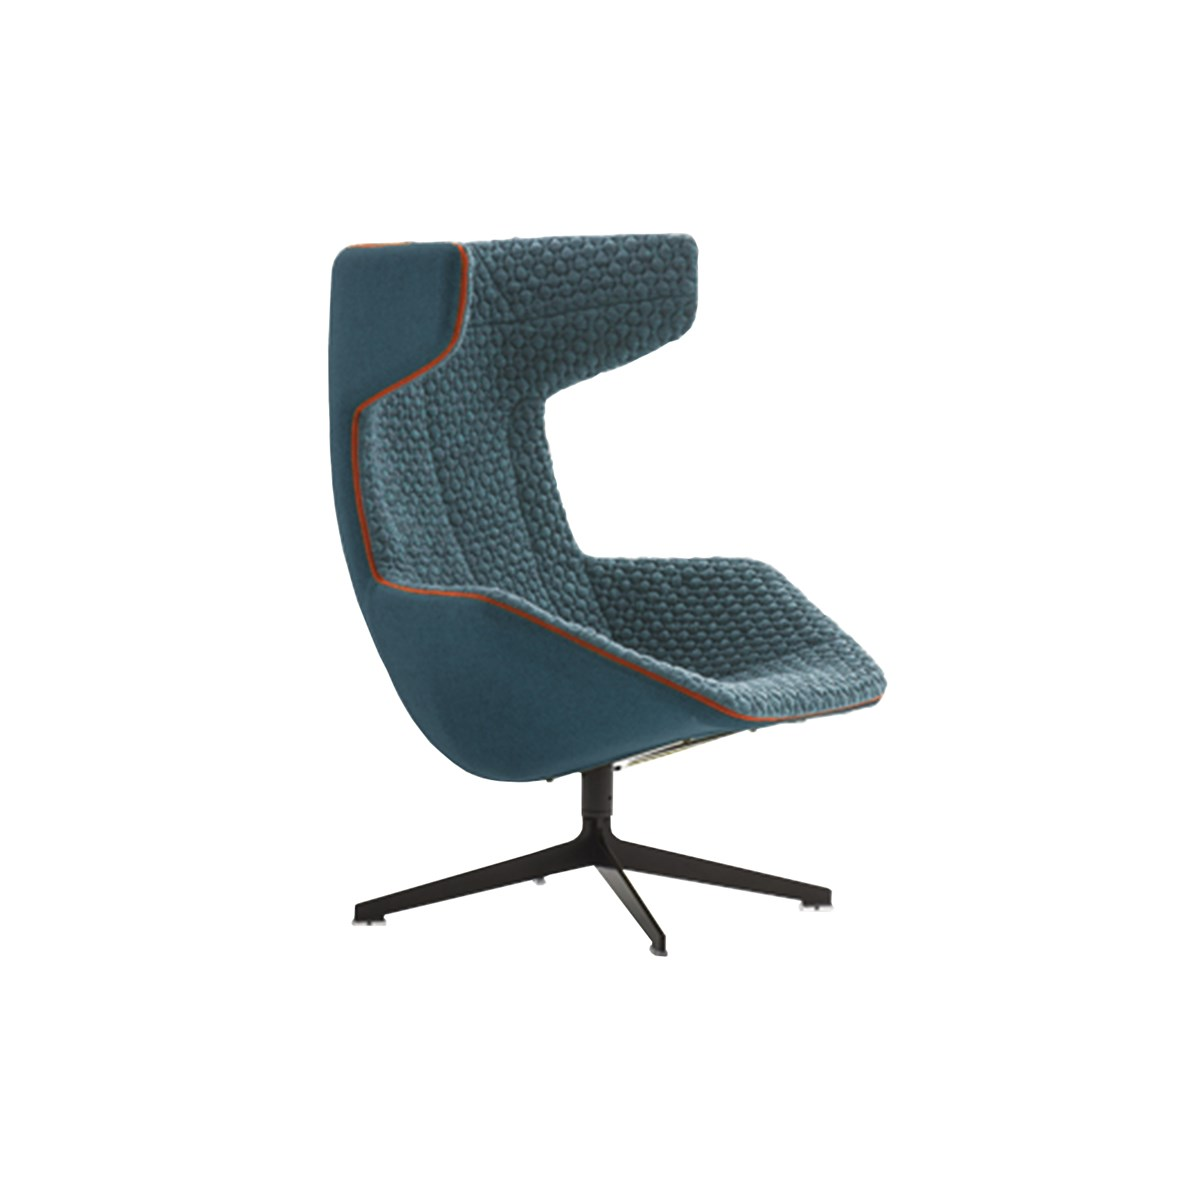 Moroso-Alfredo-Häberli-Take-A-Line-For-A-Walk-Lounge-Chair-Matisse-1